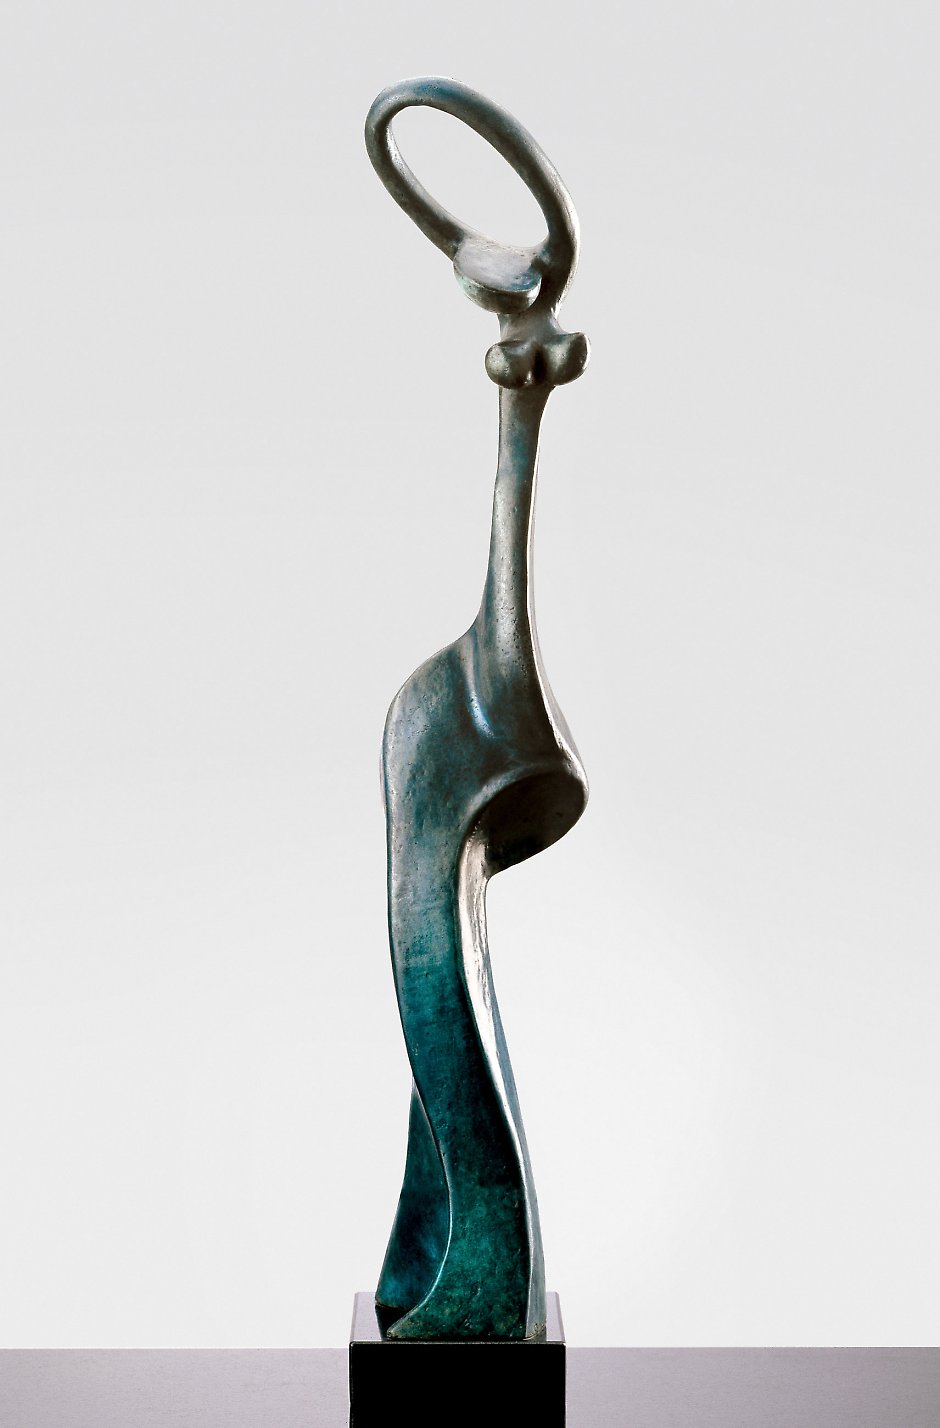 sculptures sculpture contemporaine marion b rkle marion buerkle sculptor. Black Bedroom Furniture Sets. Home Design Ideas